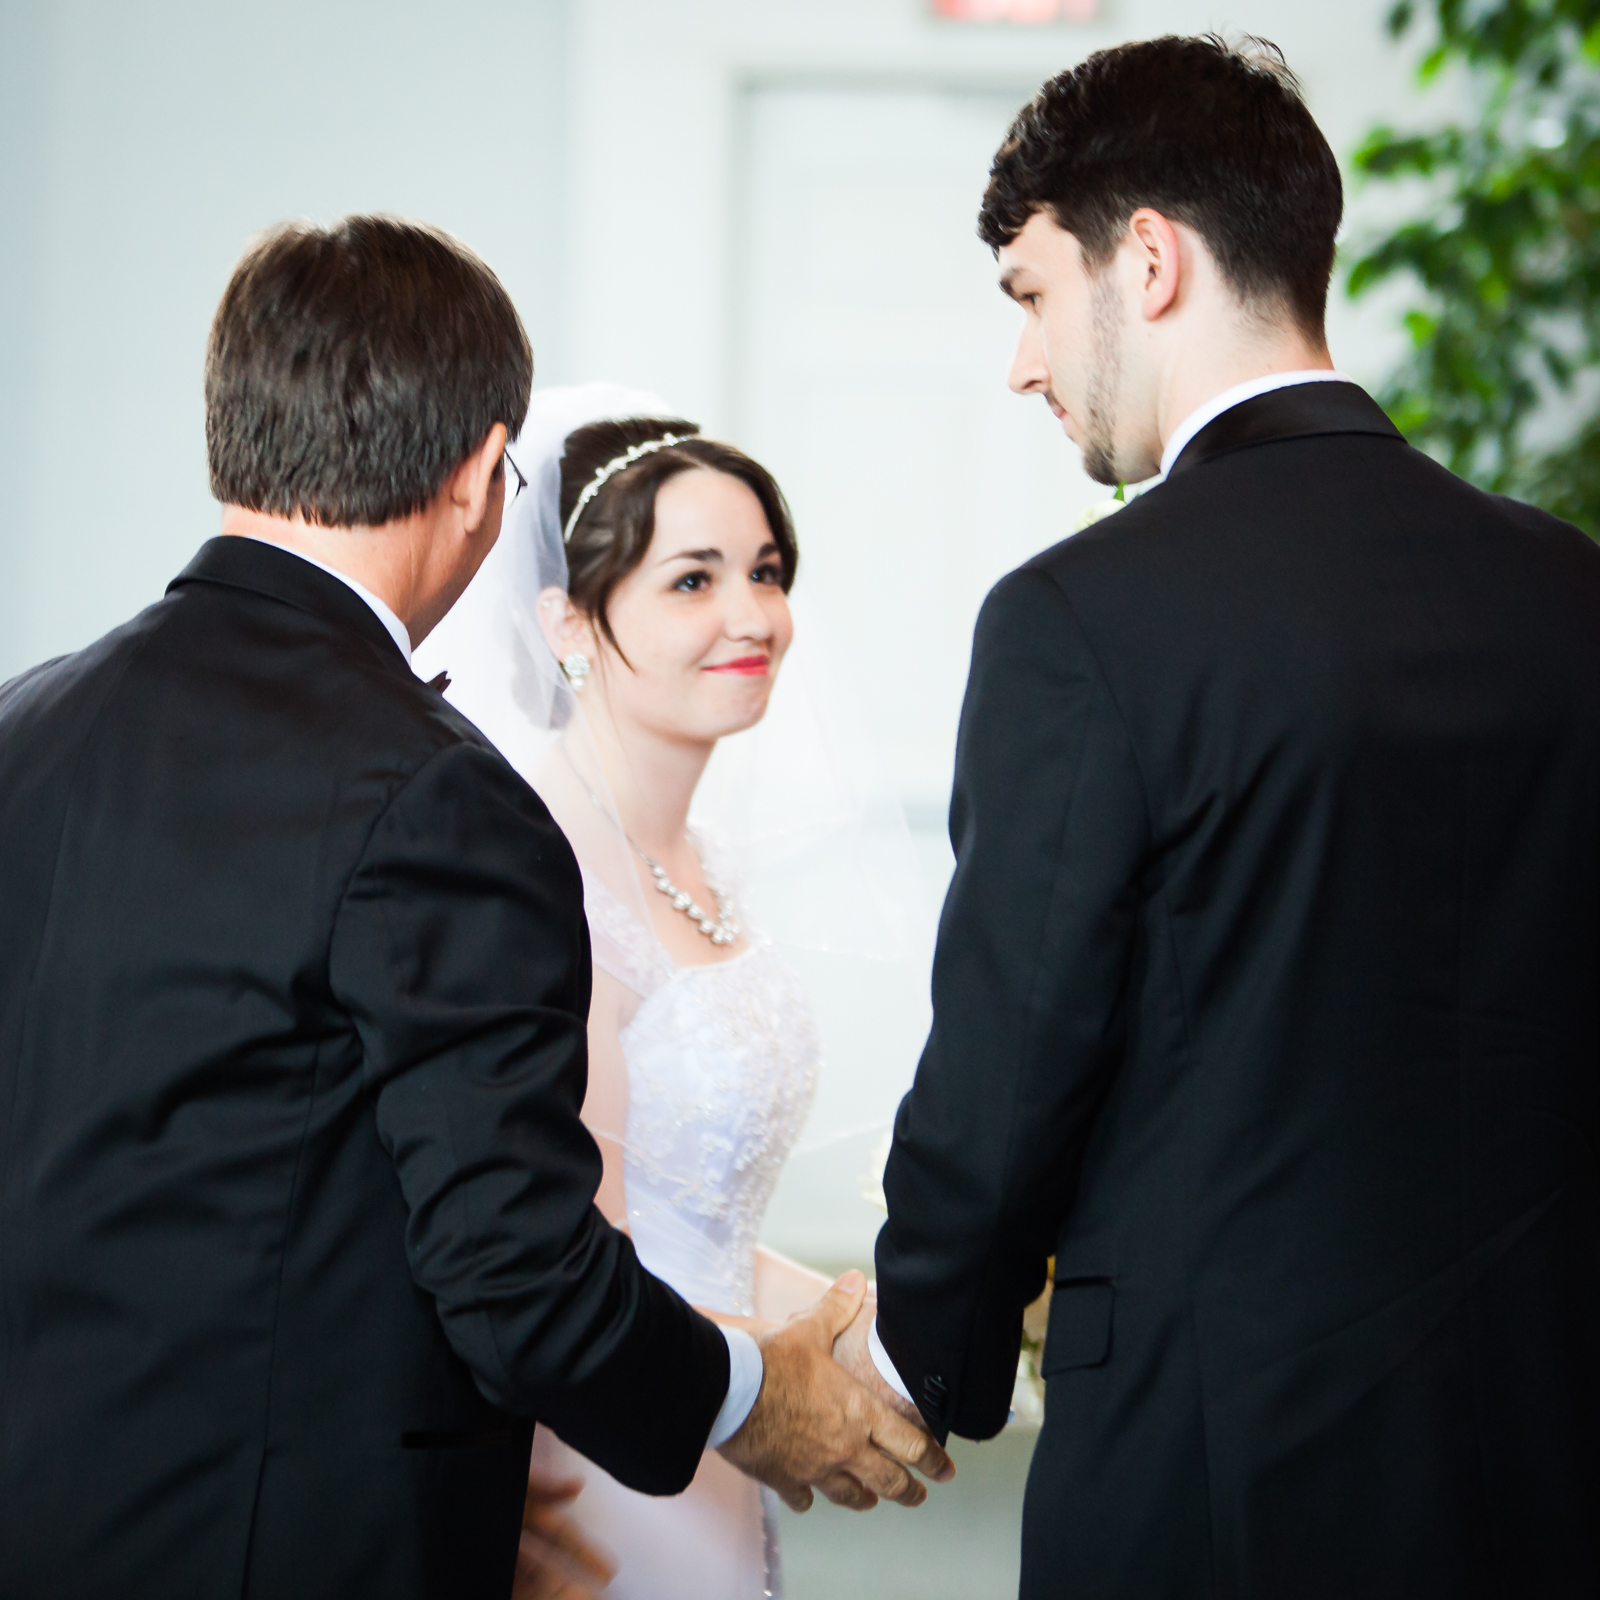 naperville-wedding-photography-54.jpg